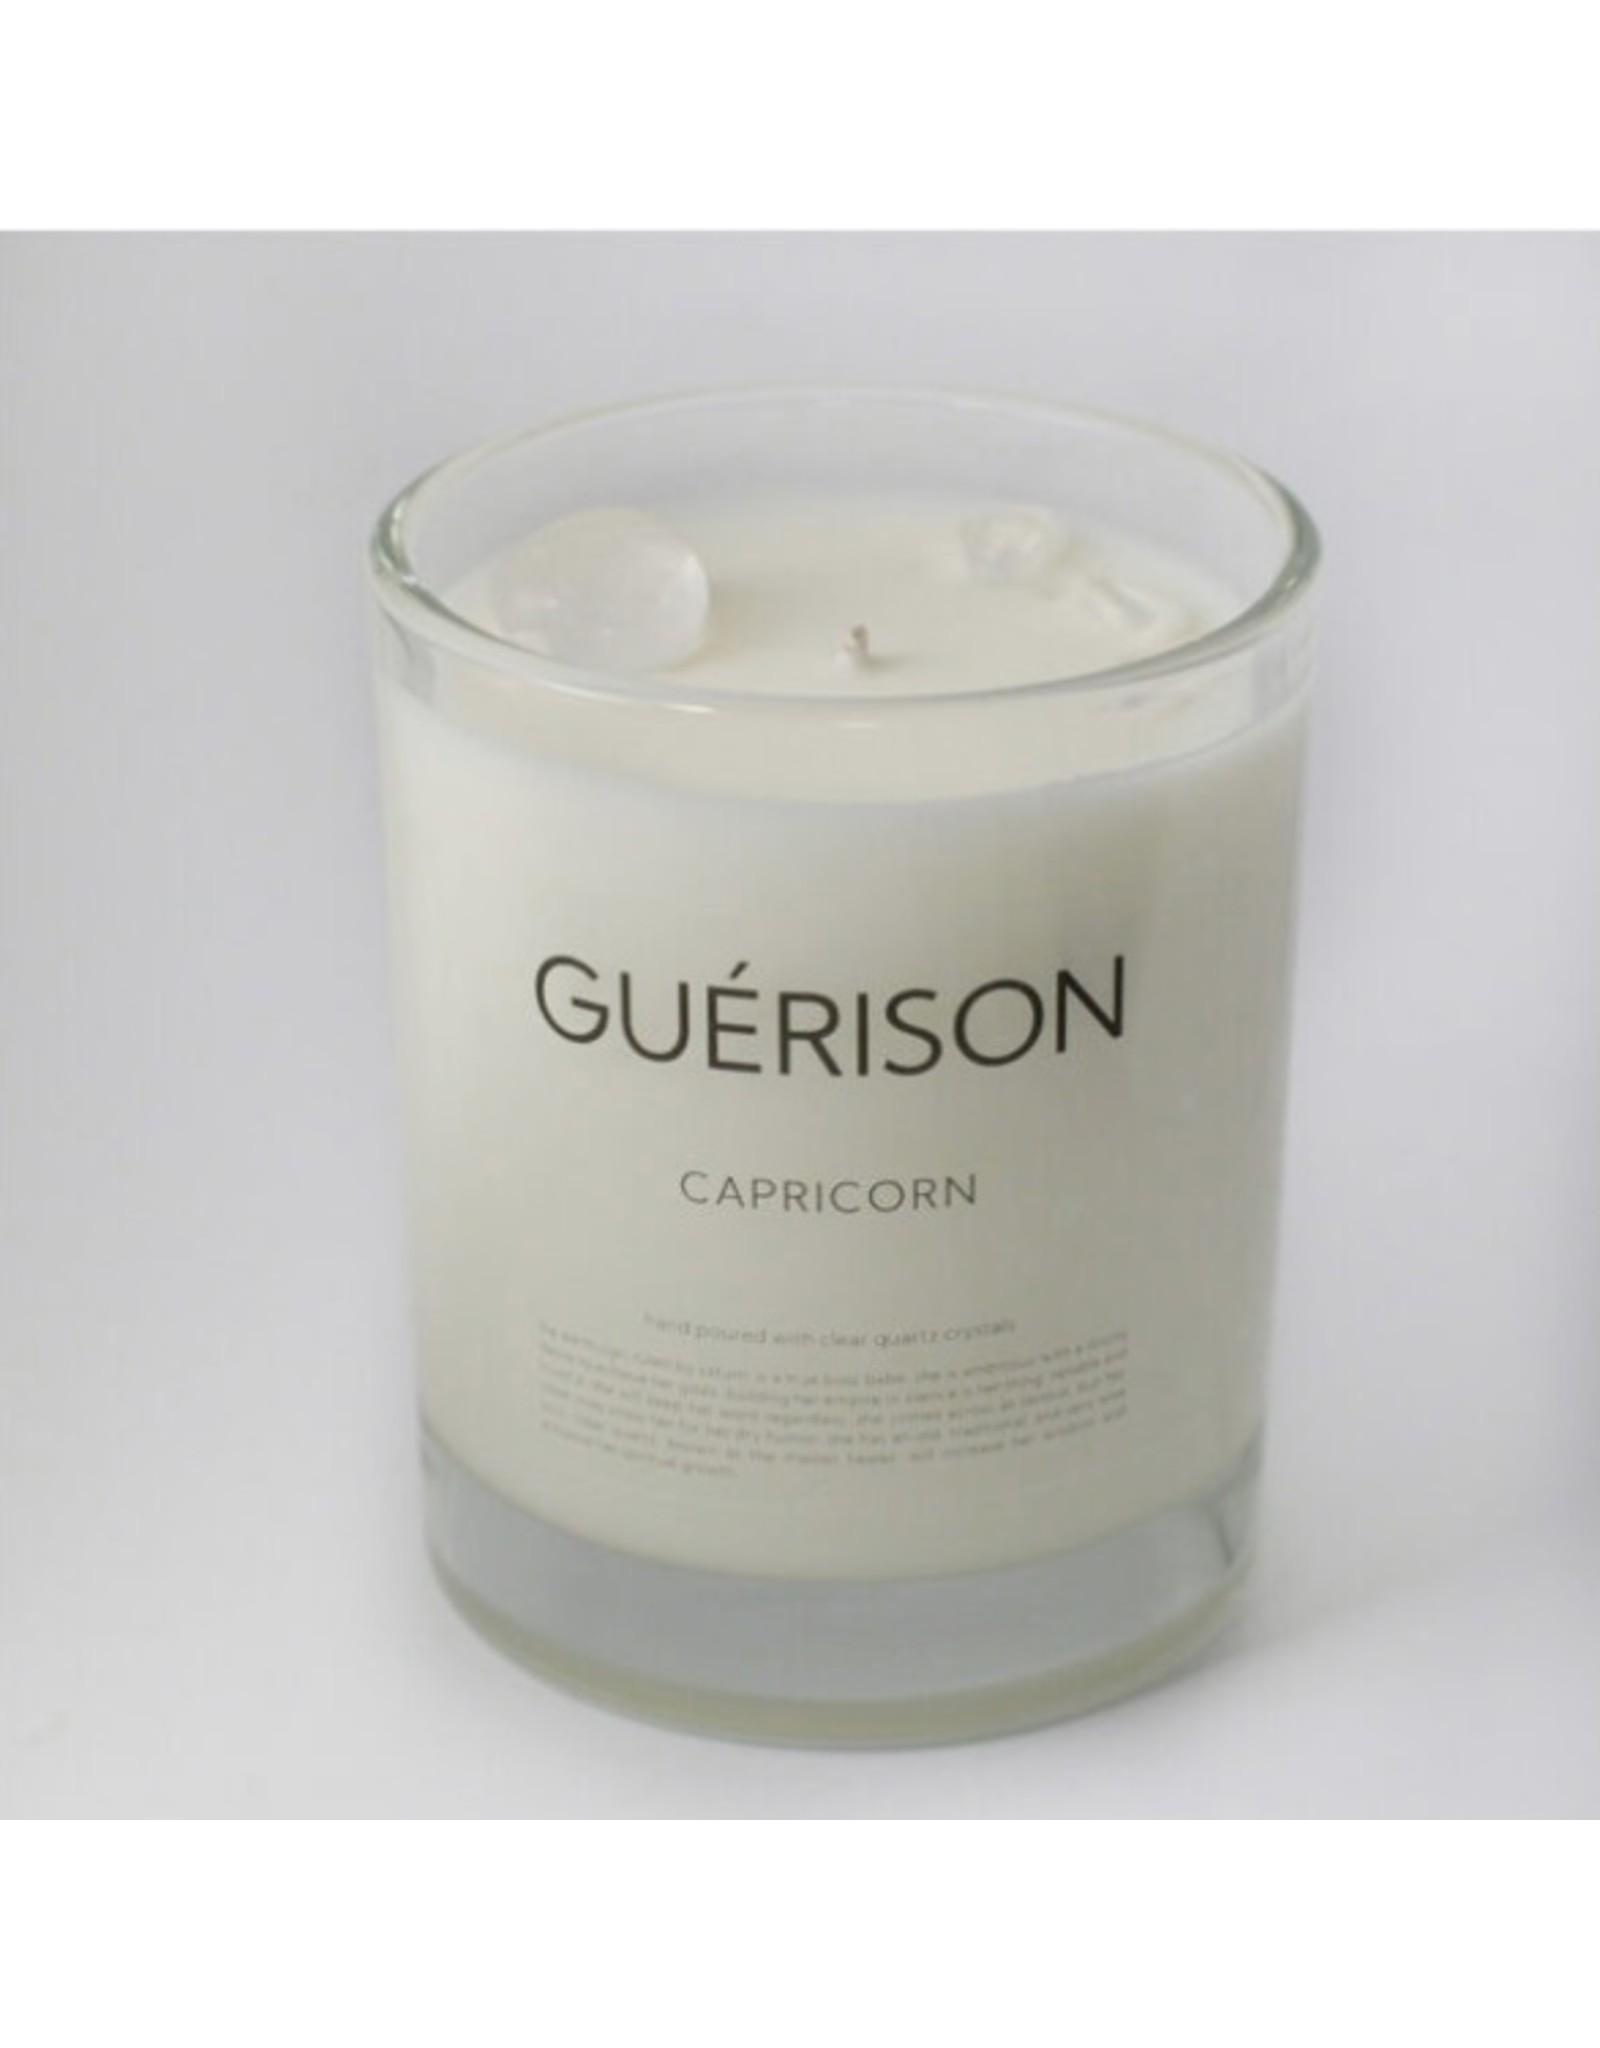 Guérison Capricorn Candle, 220g